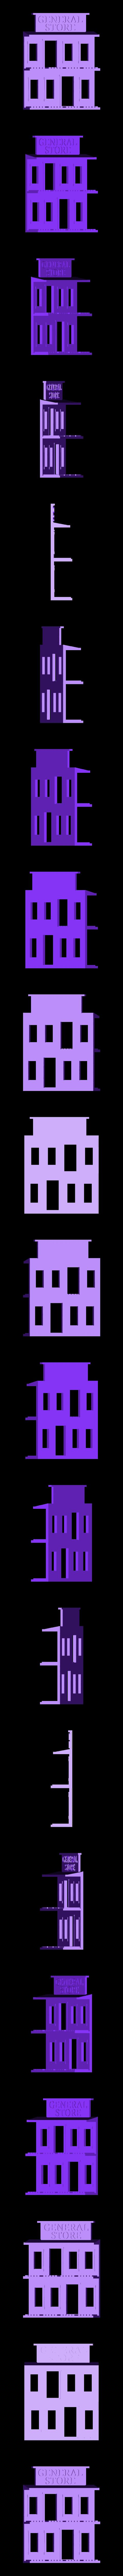 WT_Gen_Store.stl Download free STL file Western Town • 3D print model, mrhers2